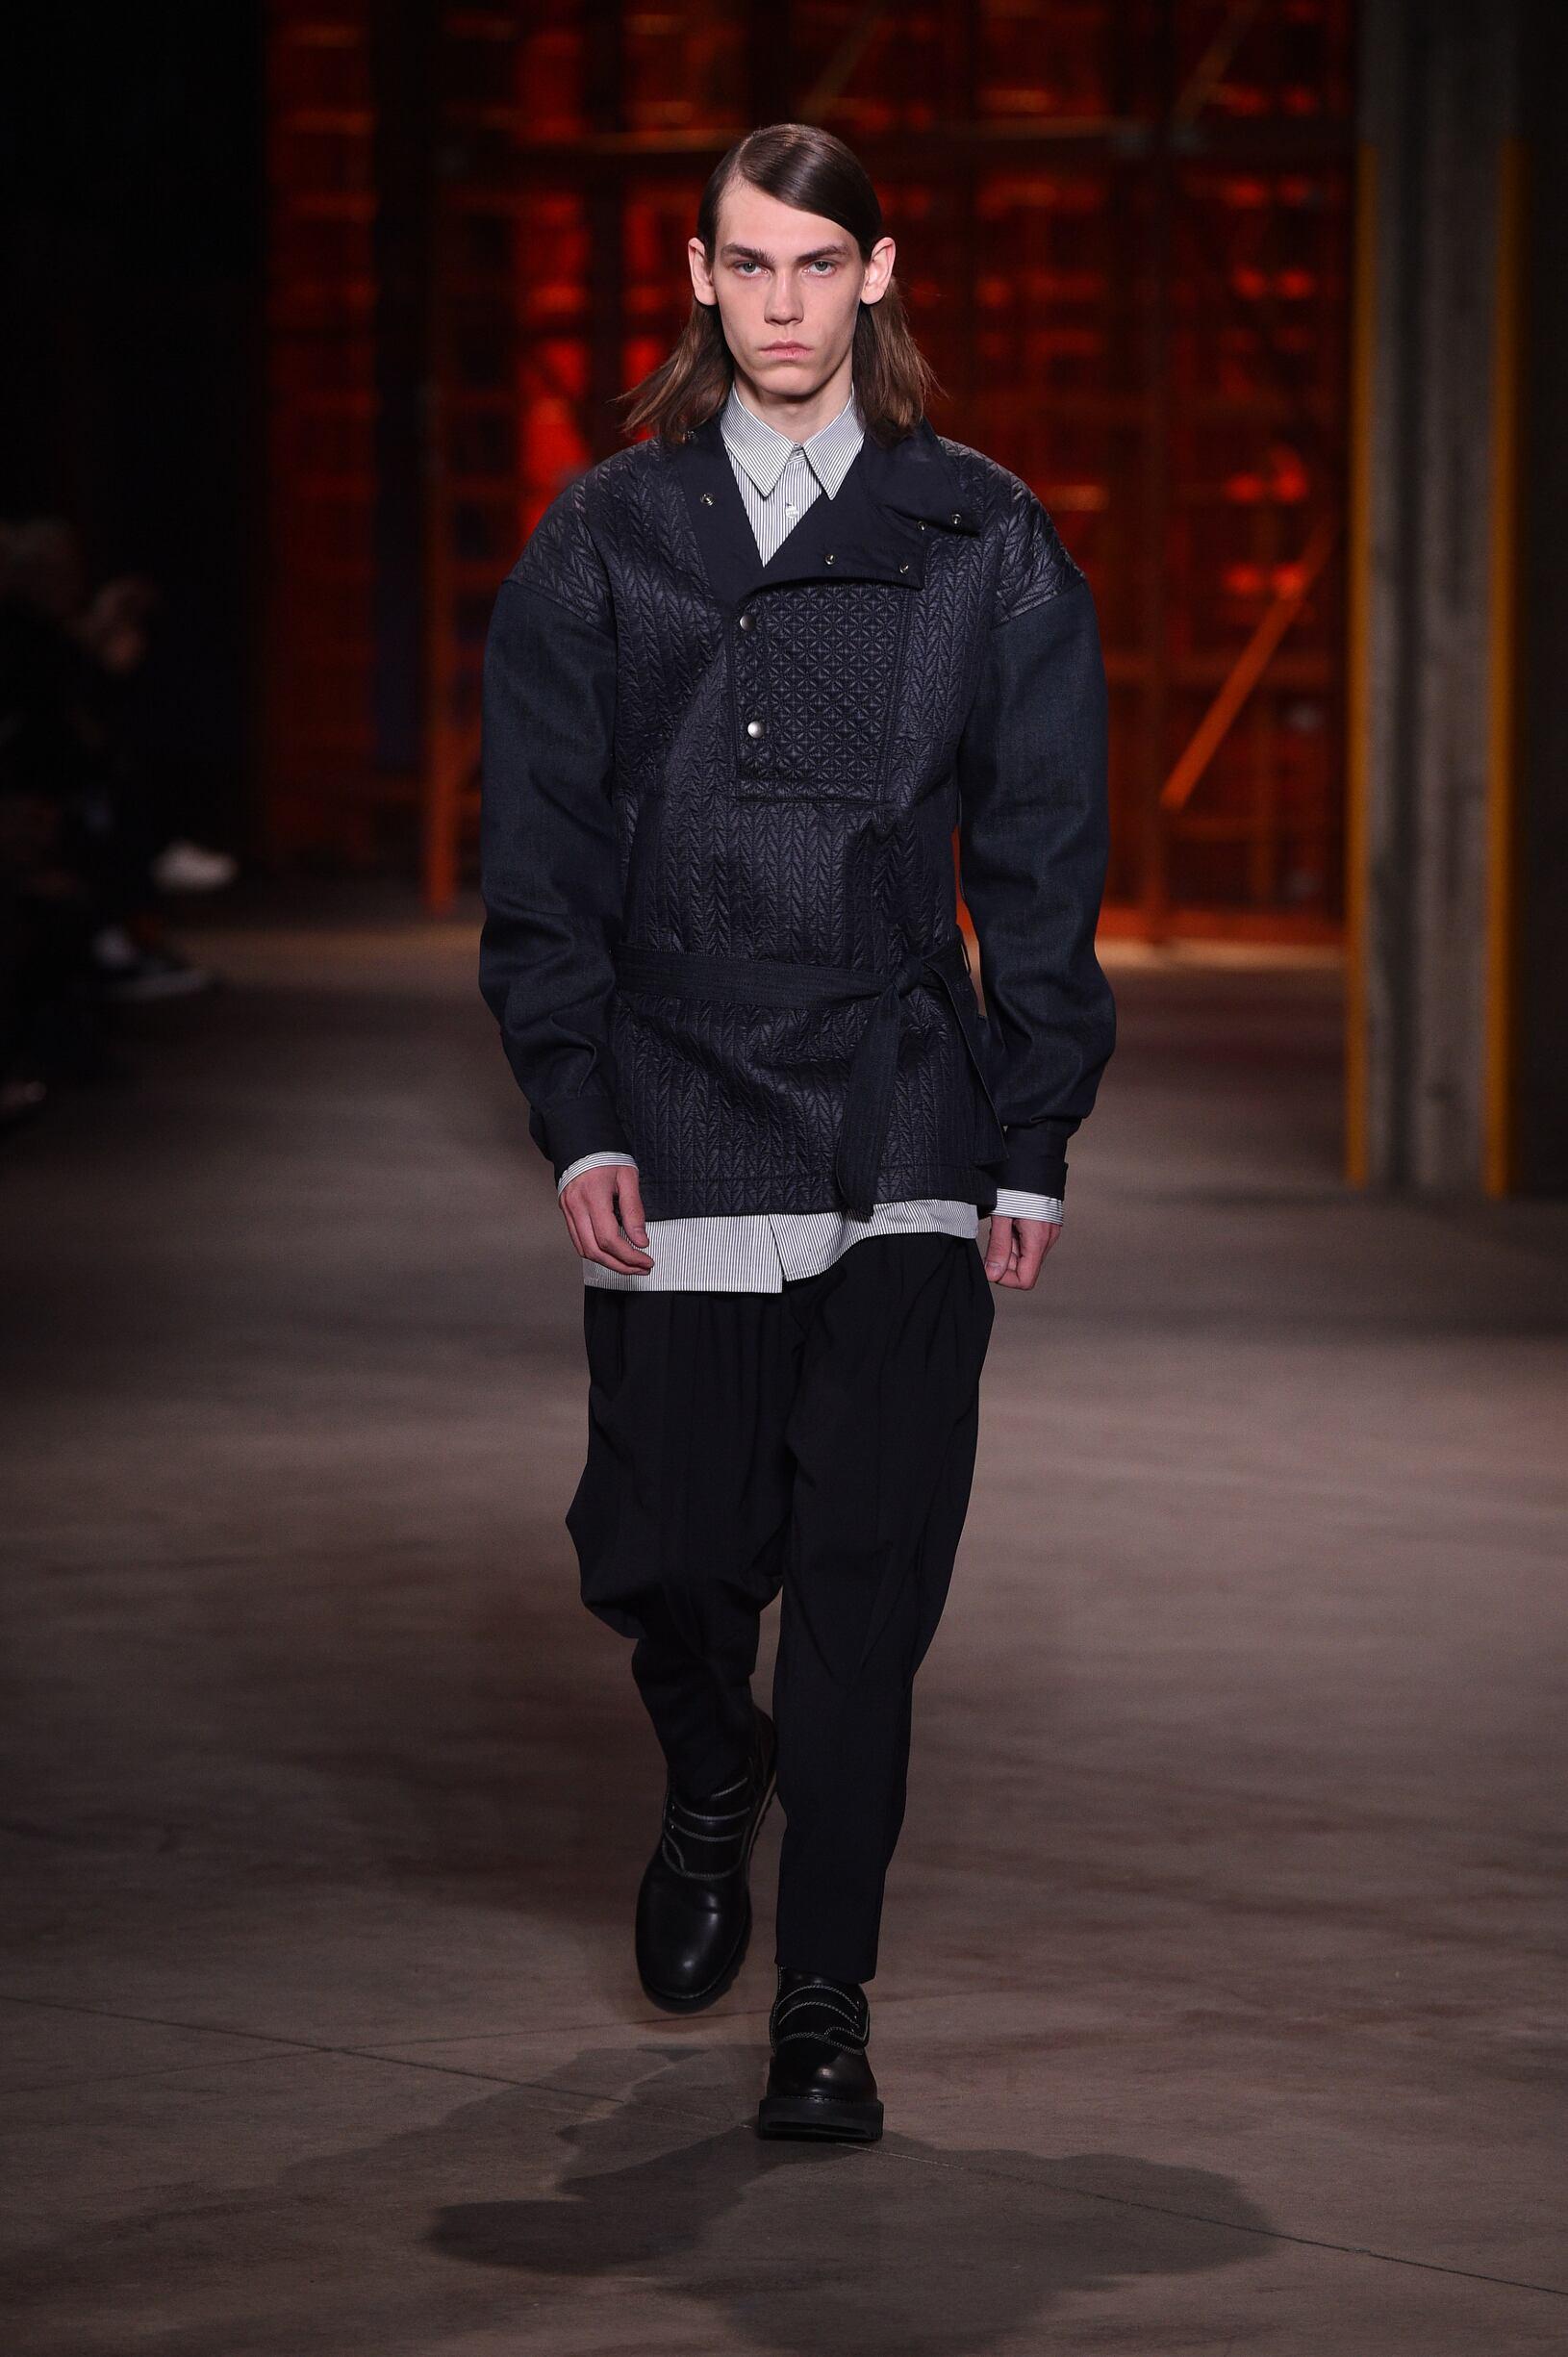 Fashion Model Diesel Black Gold Catwalk